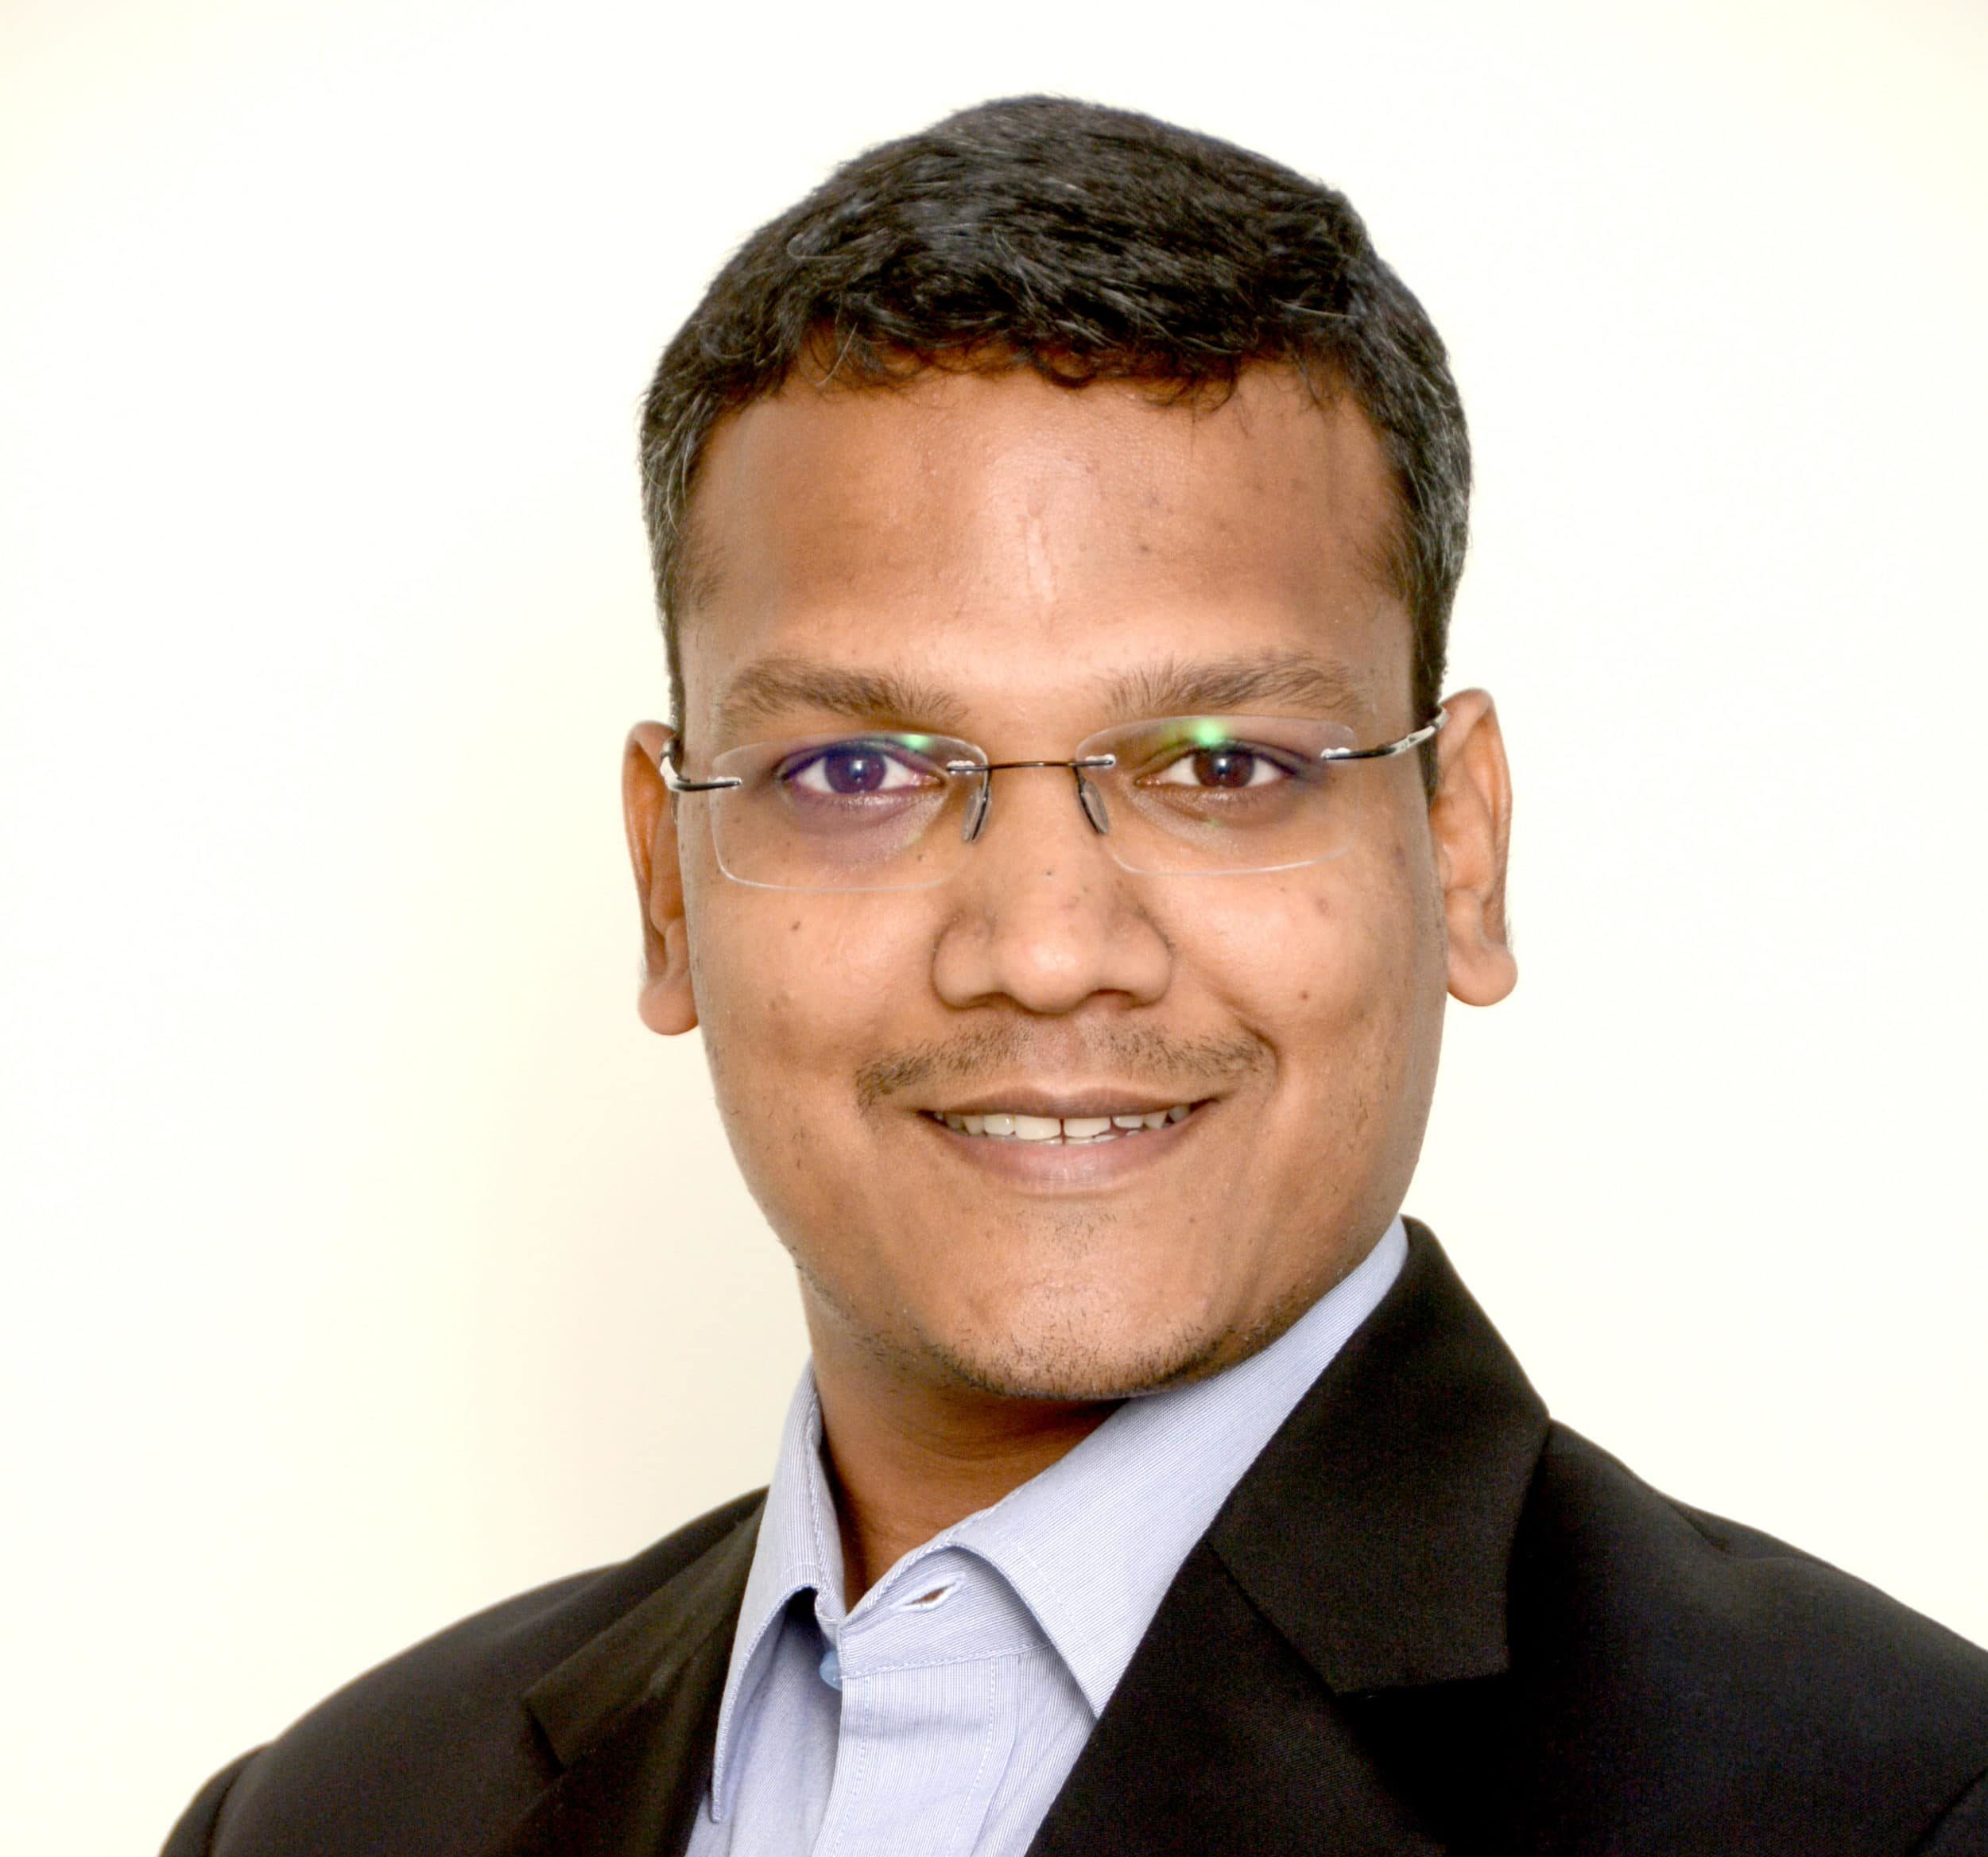 image-Kunal Mahipal, CEO of Onsitego-MediaBrief.jpg